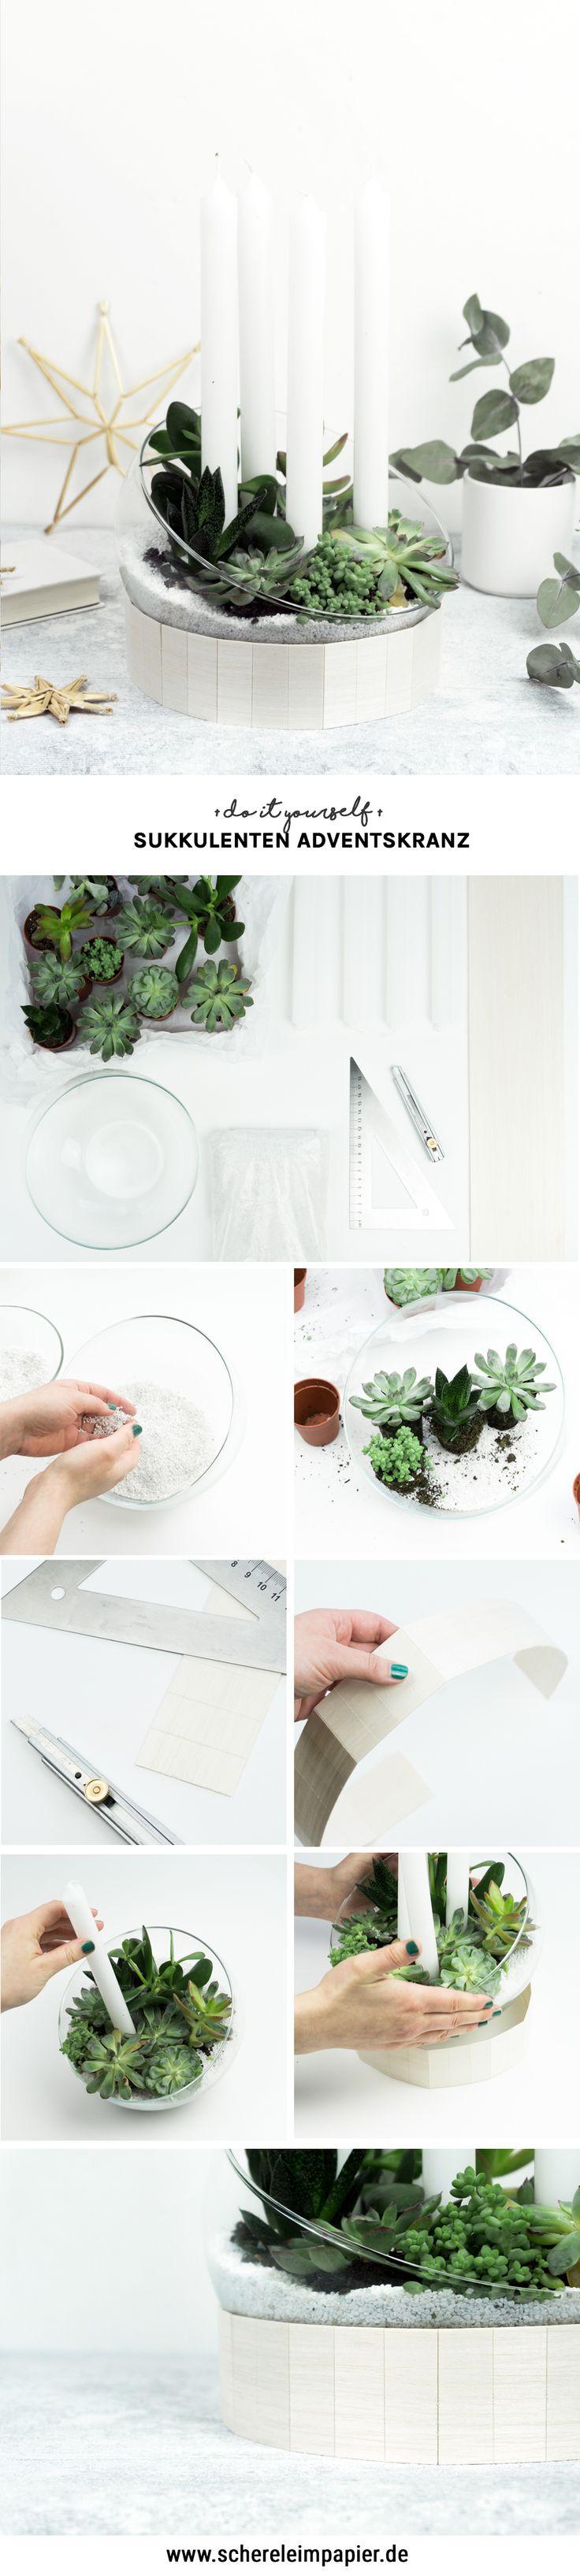 468 best schereleimpapier DIY & Upcycling images on Pinterest